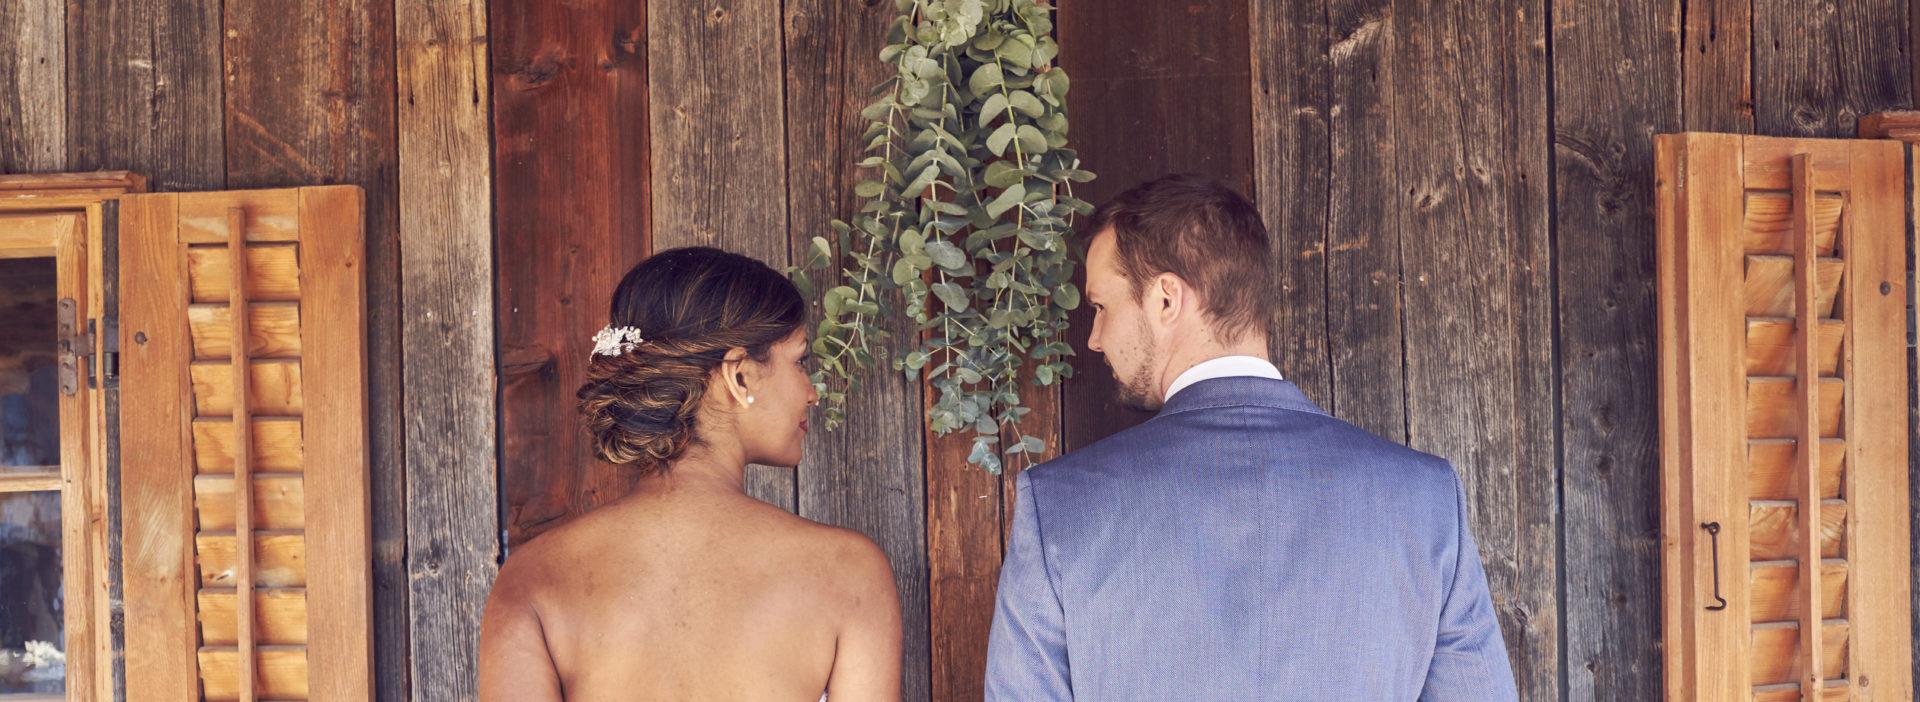 Bächlihof Schopf Heiraten Brautpaar